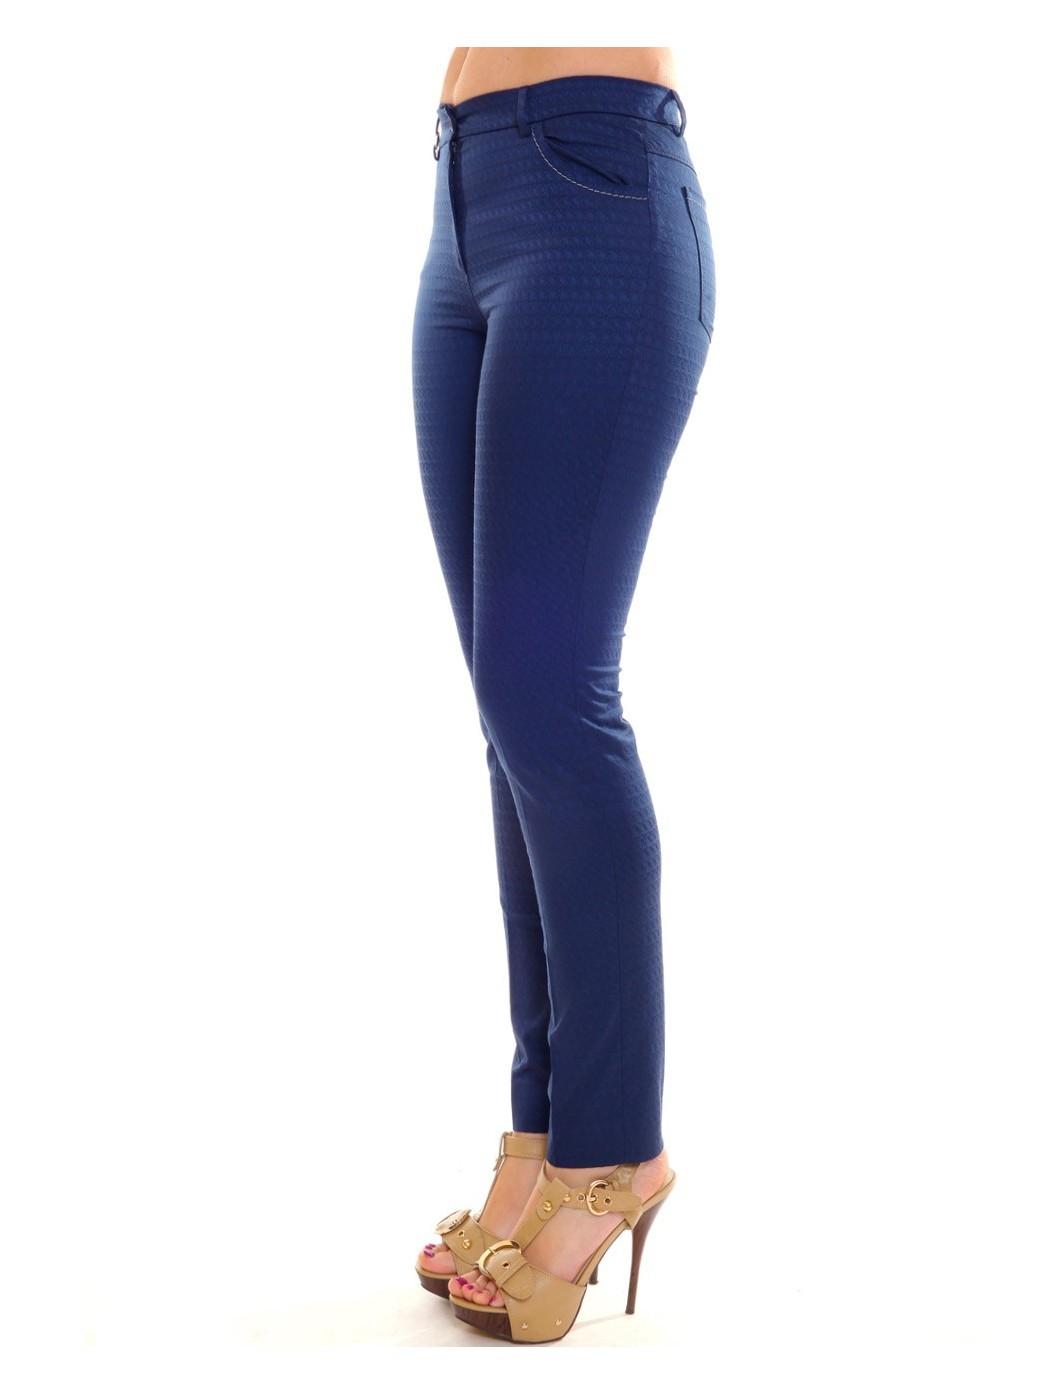 L.P. trousers